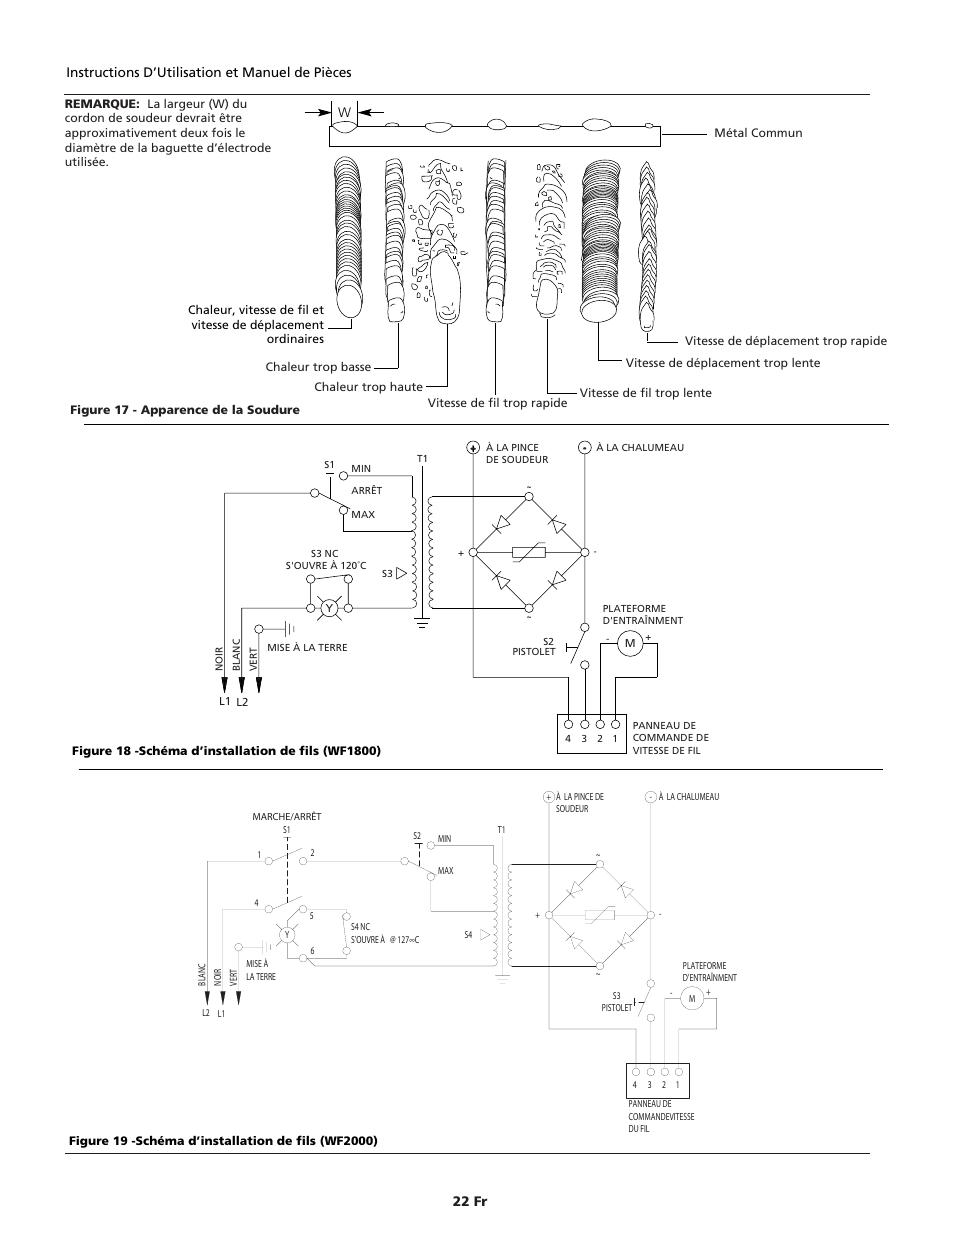 medium resolution of campbell hausfeld wiring diagram wiring library campbell hausfeld wire feed wf1900 user manual page 22 40